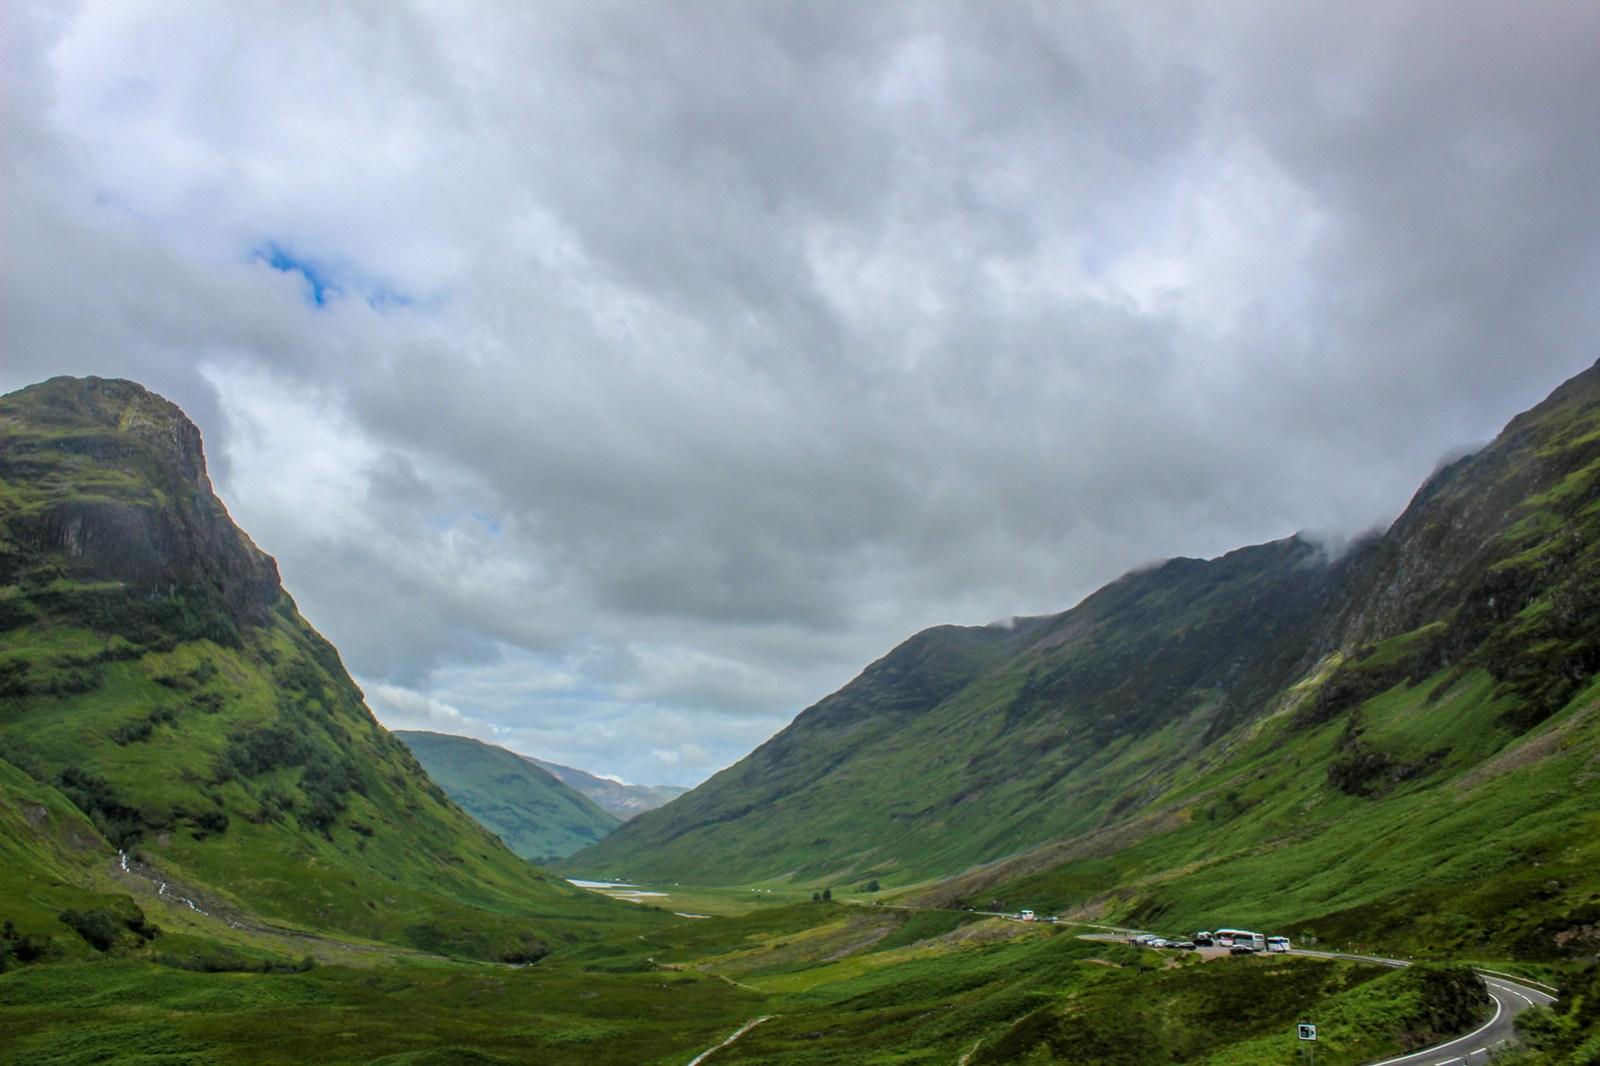 travel tips to scotland: go beyond loch ness